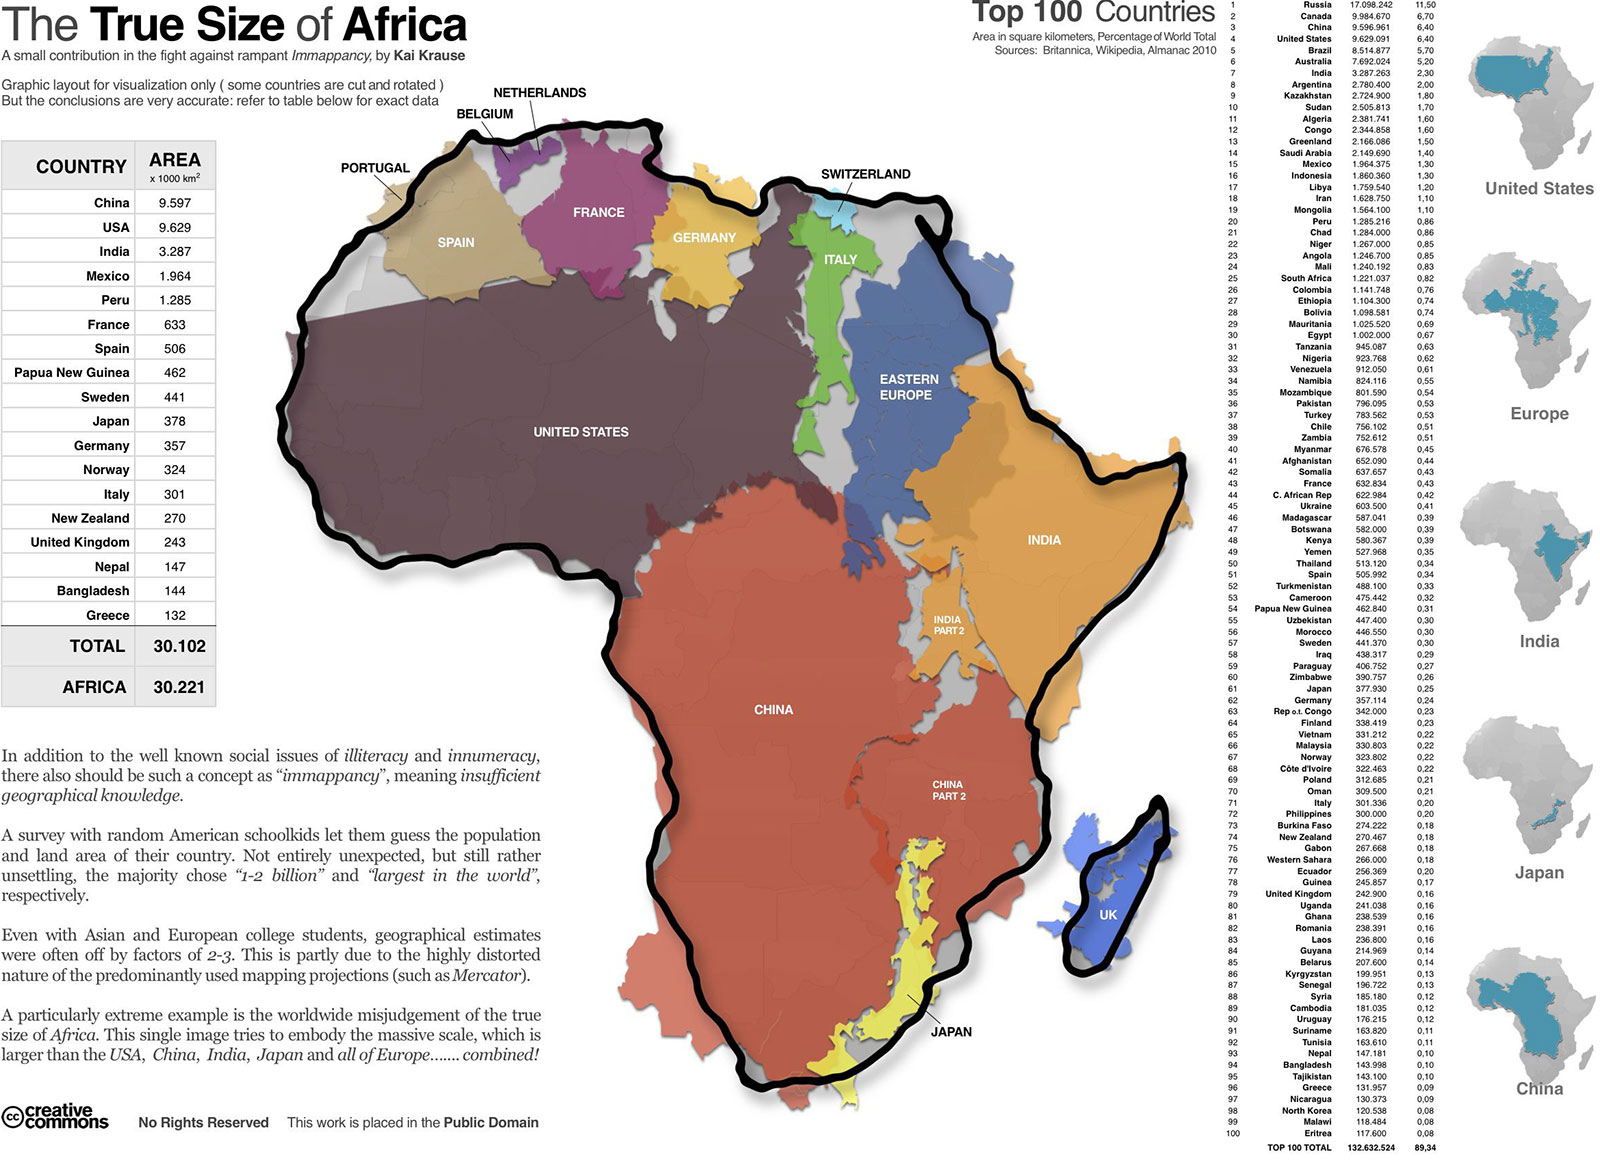 True size of Africa. Image: Kai Krause